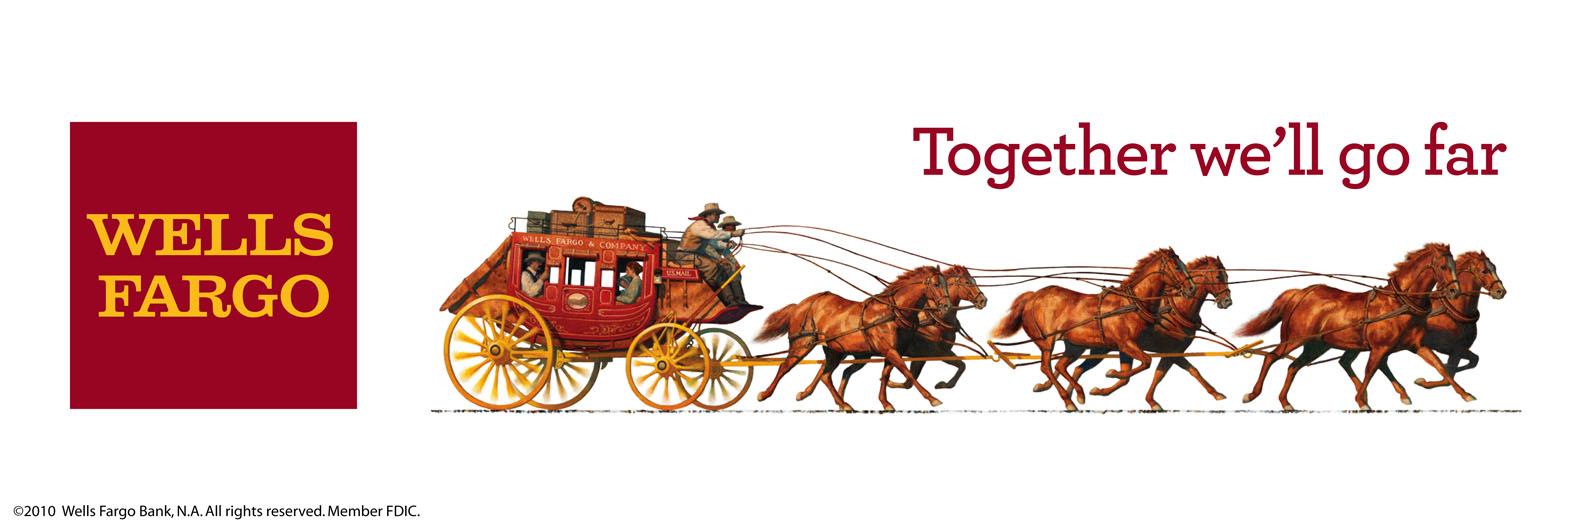 wells fargo stagecoach logo png generic2 vbec Wells Fargo Stagecoach Vector Wells Fargo Stagecoach Vector